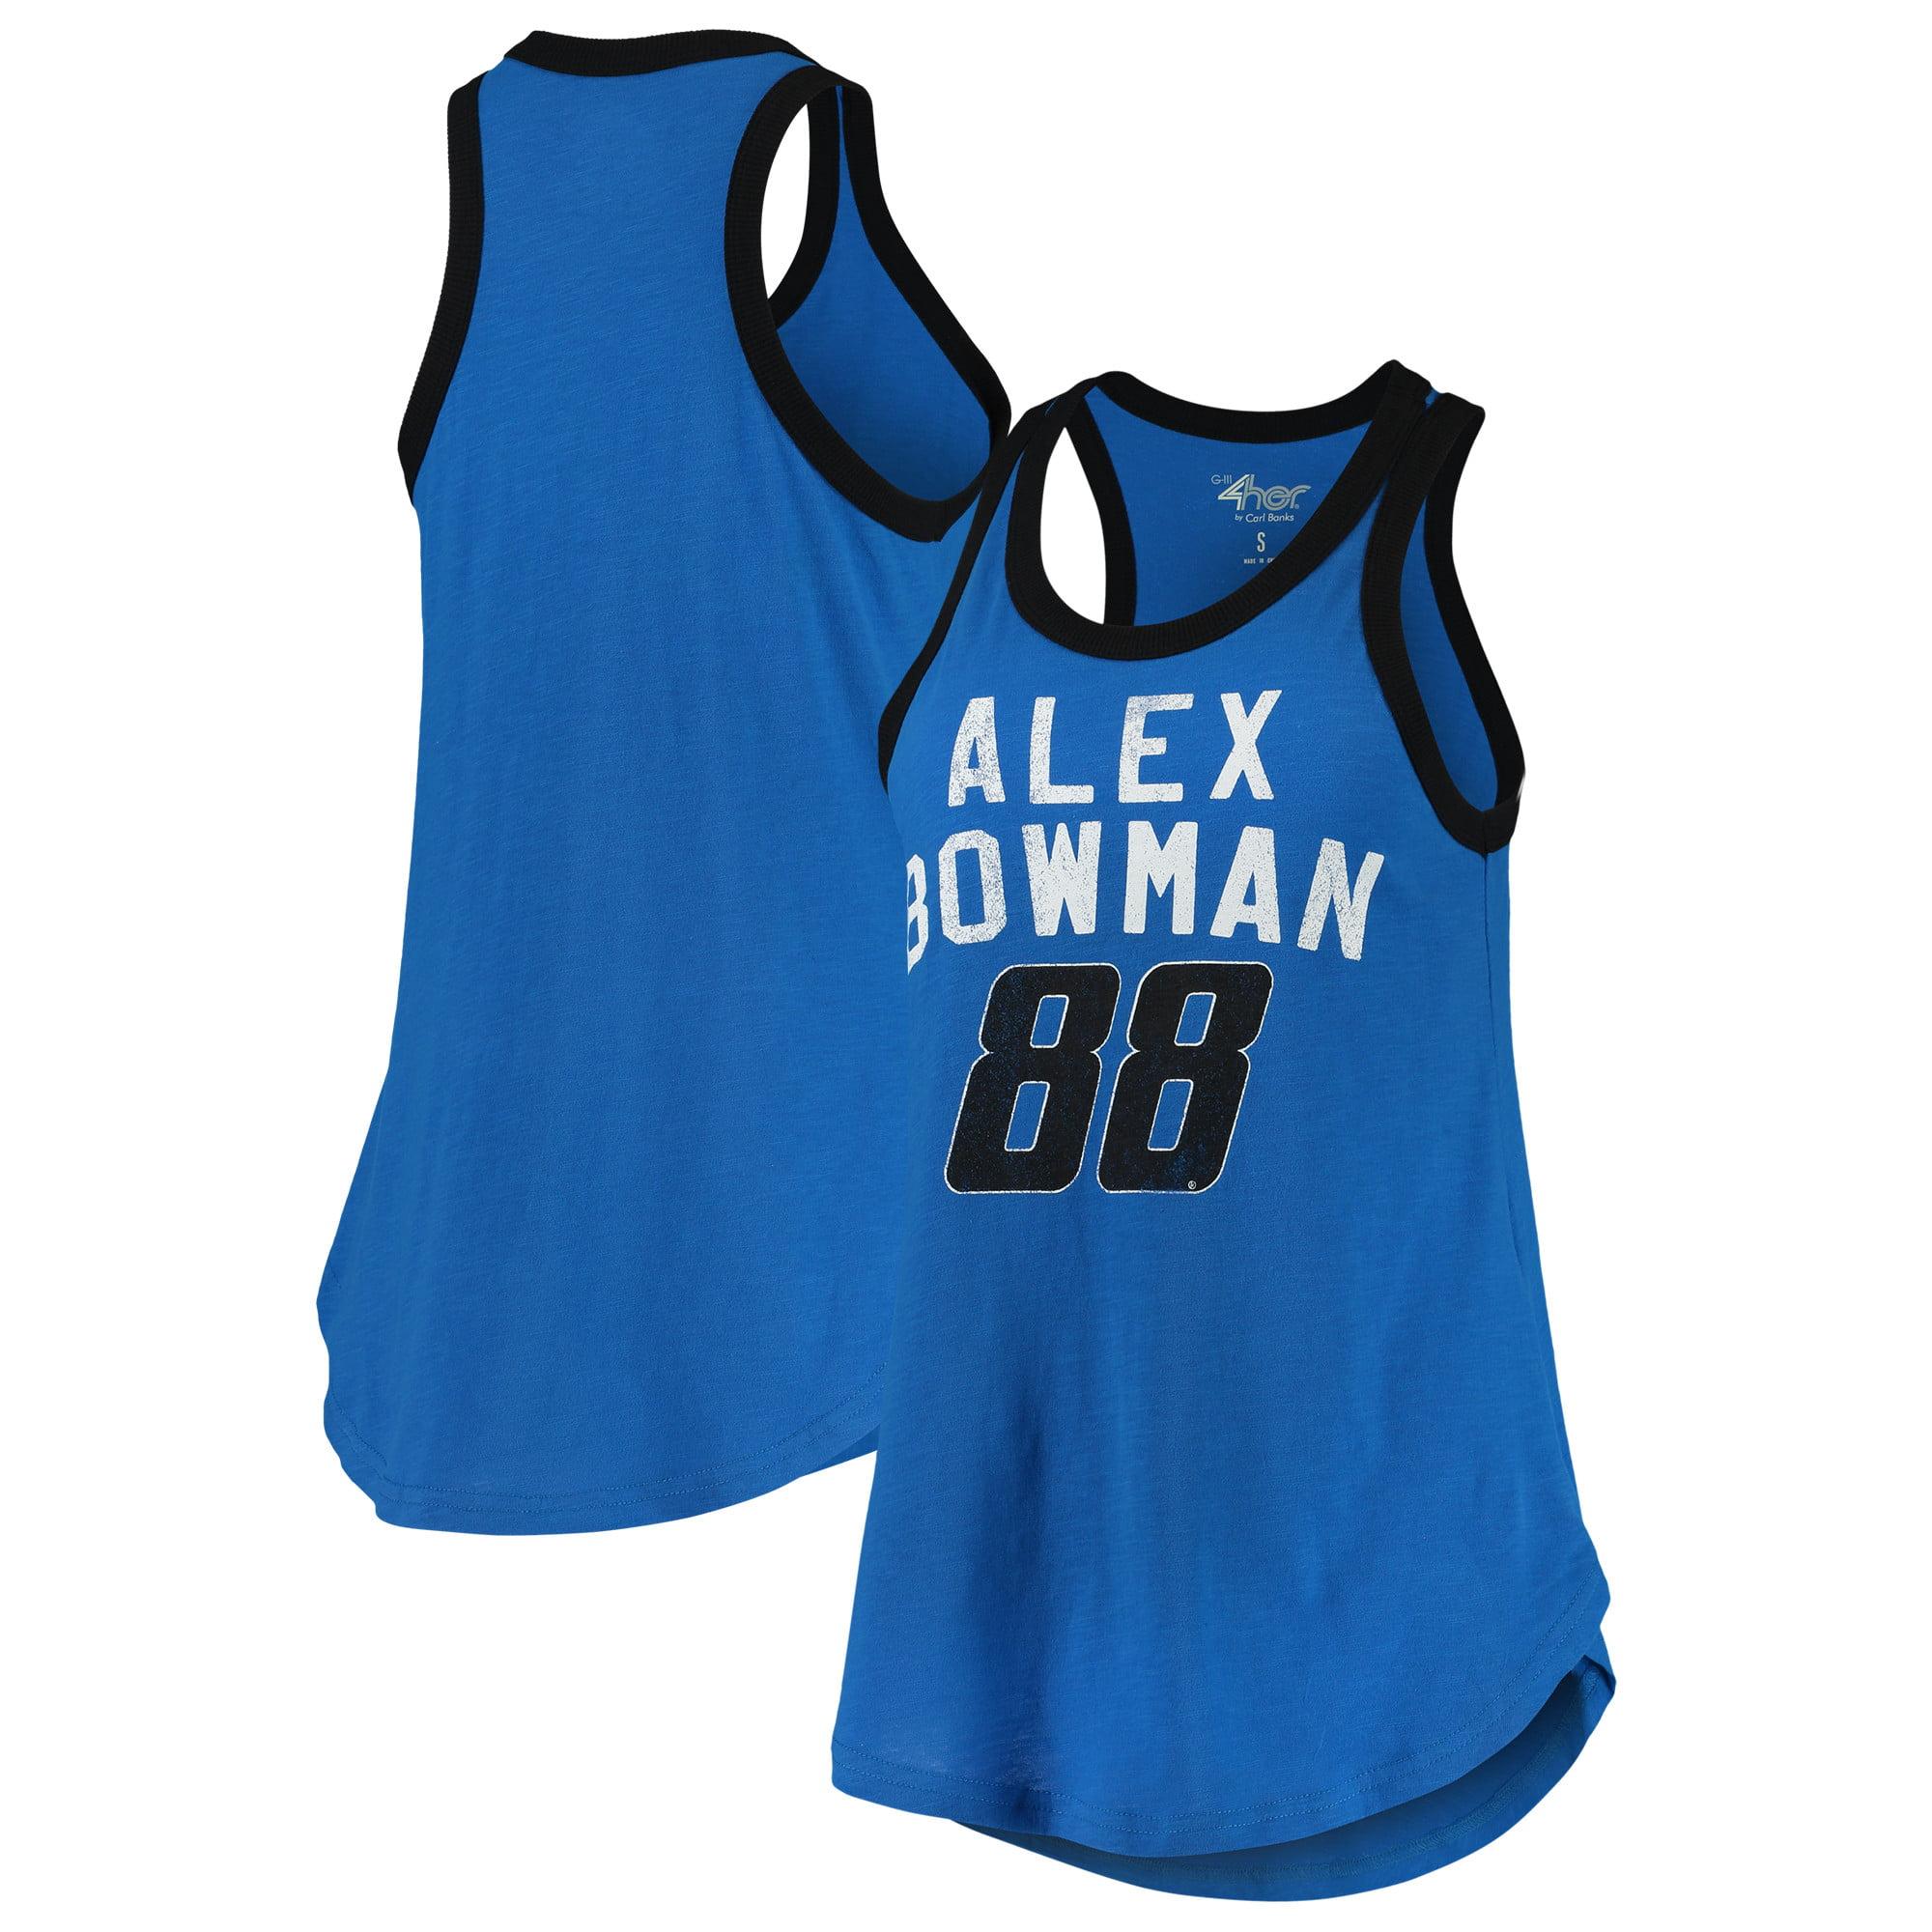 Alex Bowman G-III 4Her by Carl Banks Women's Training Day Tank Top - Light Blue